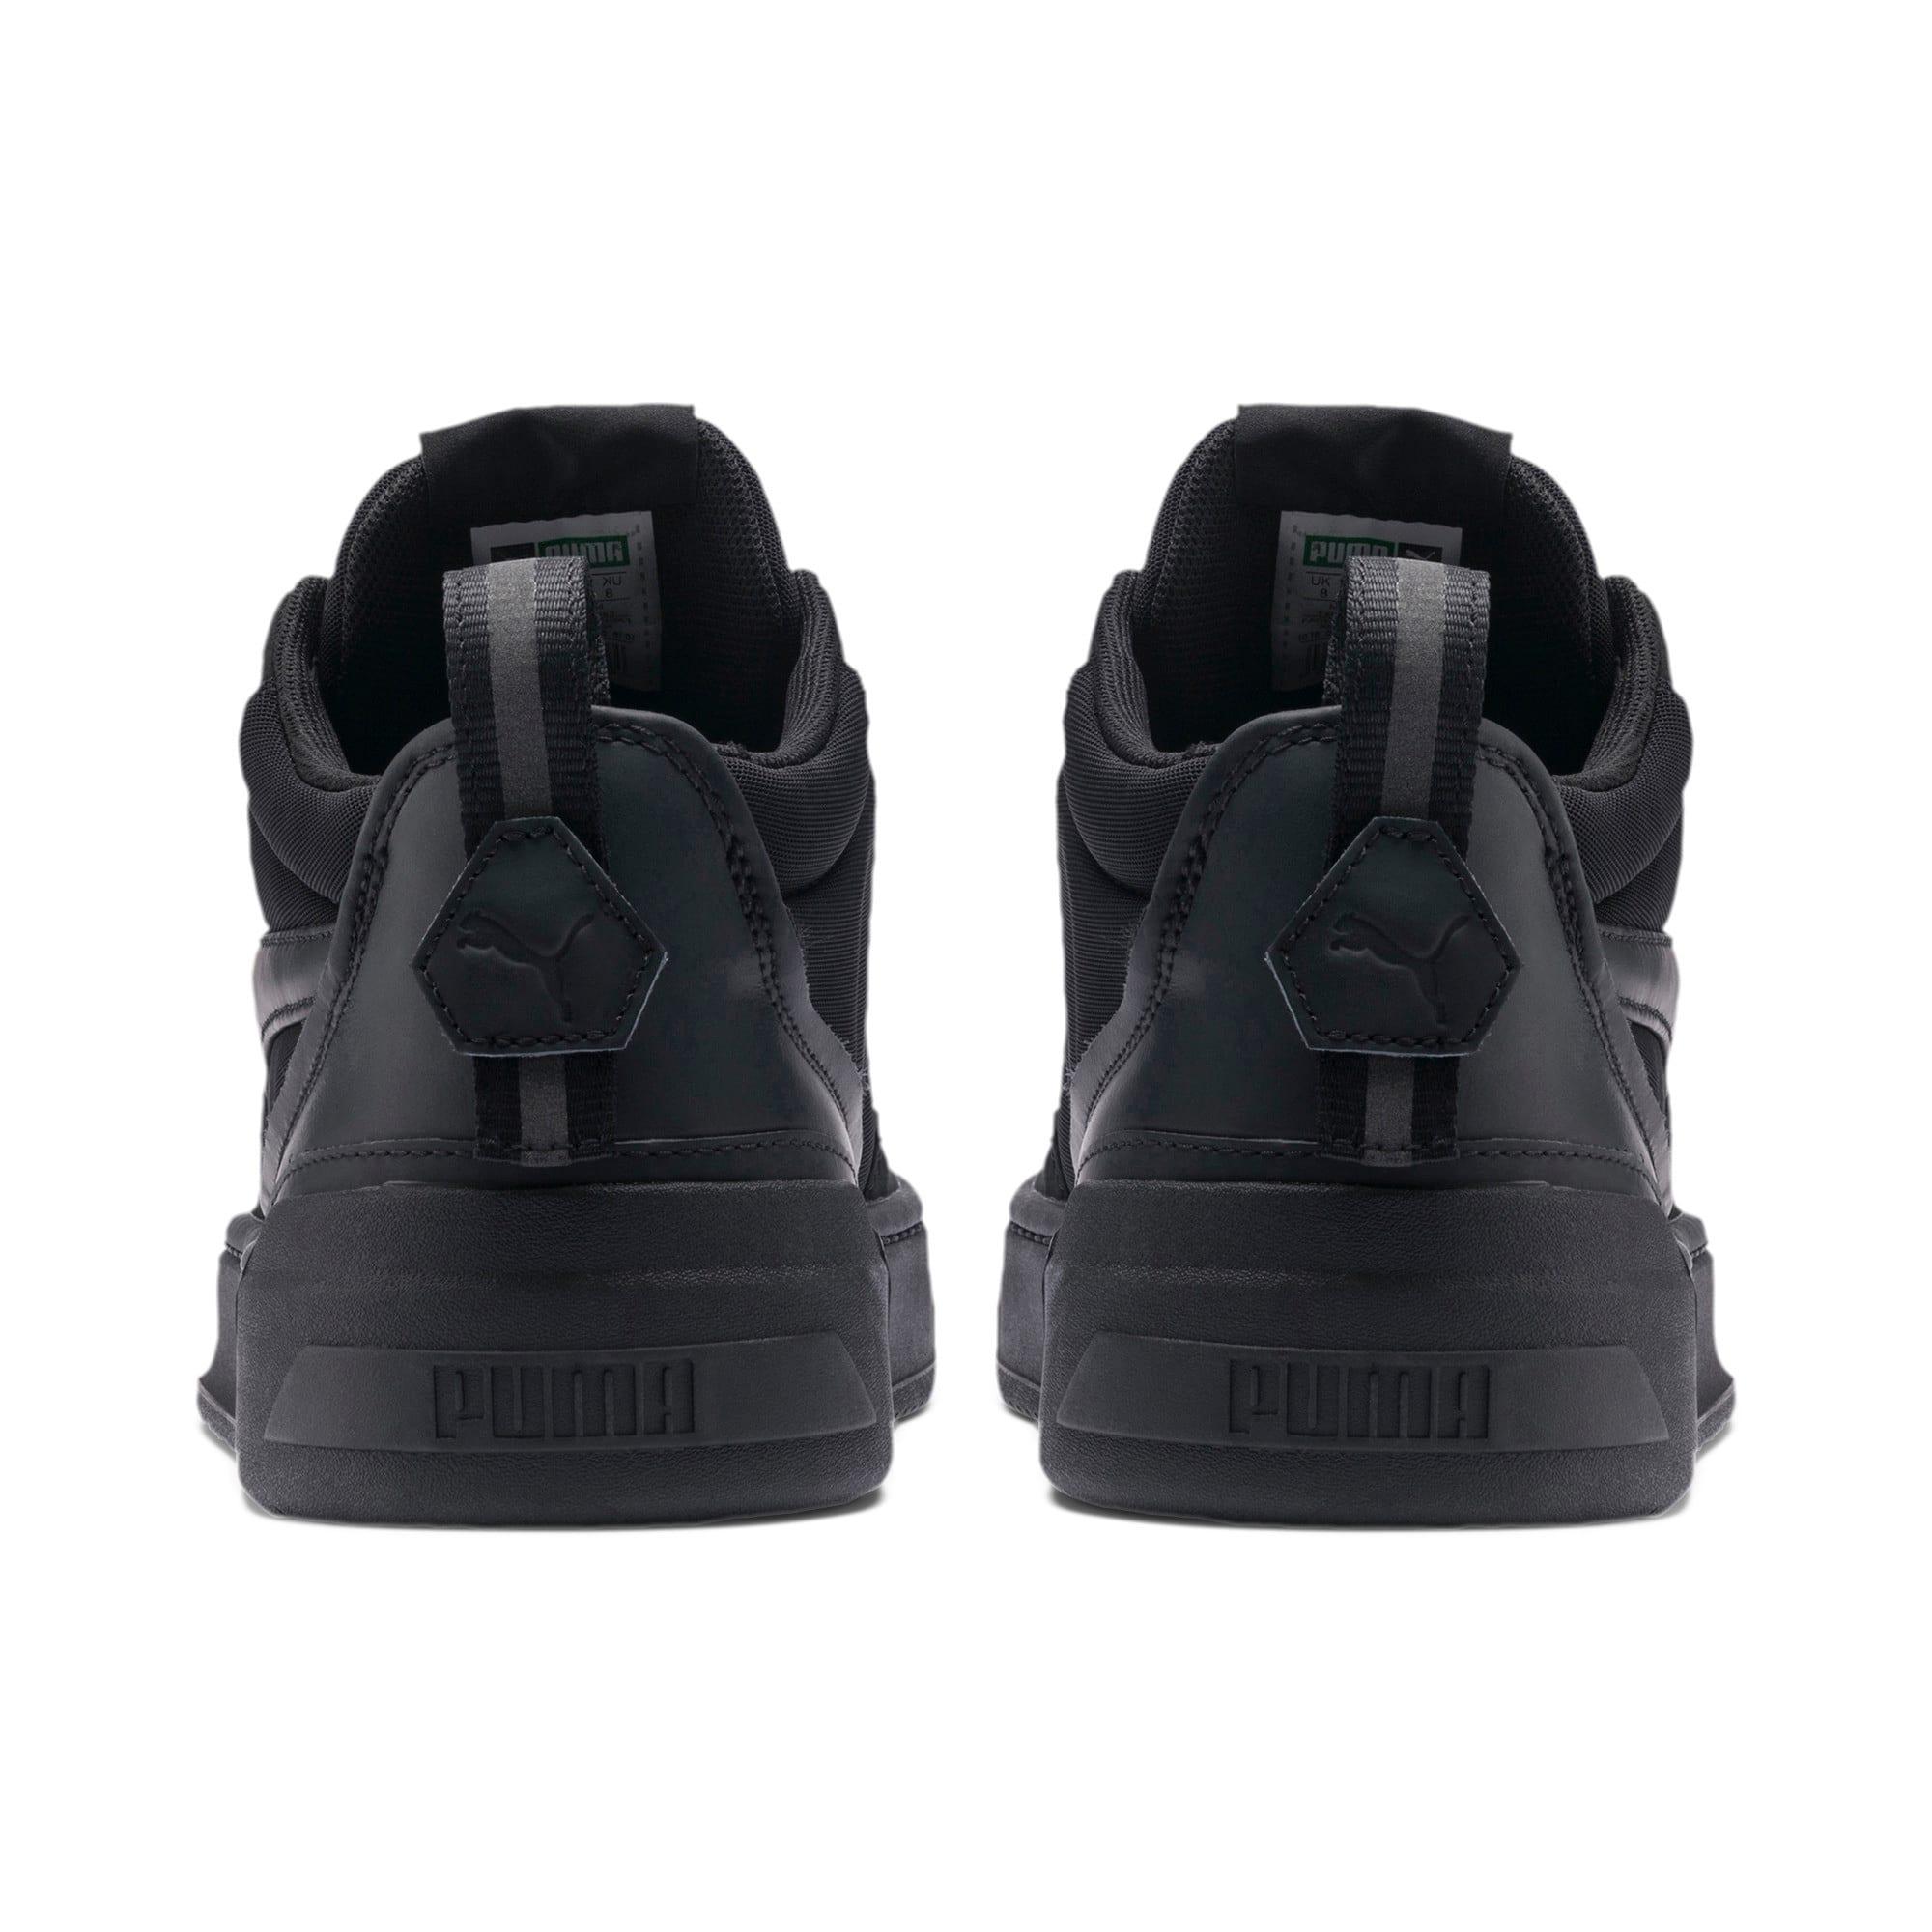 Thumbnail 3 of Cali Zero Demi Triple Black Sneakers, Puma Black-Puma Black, medium